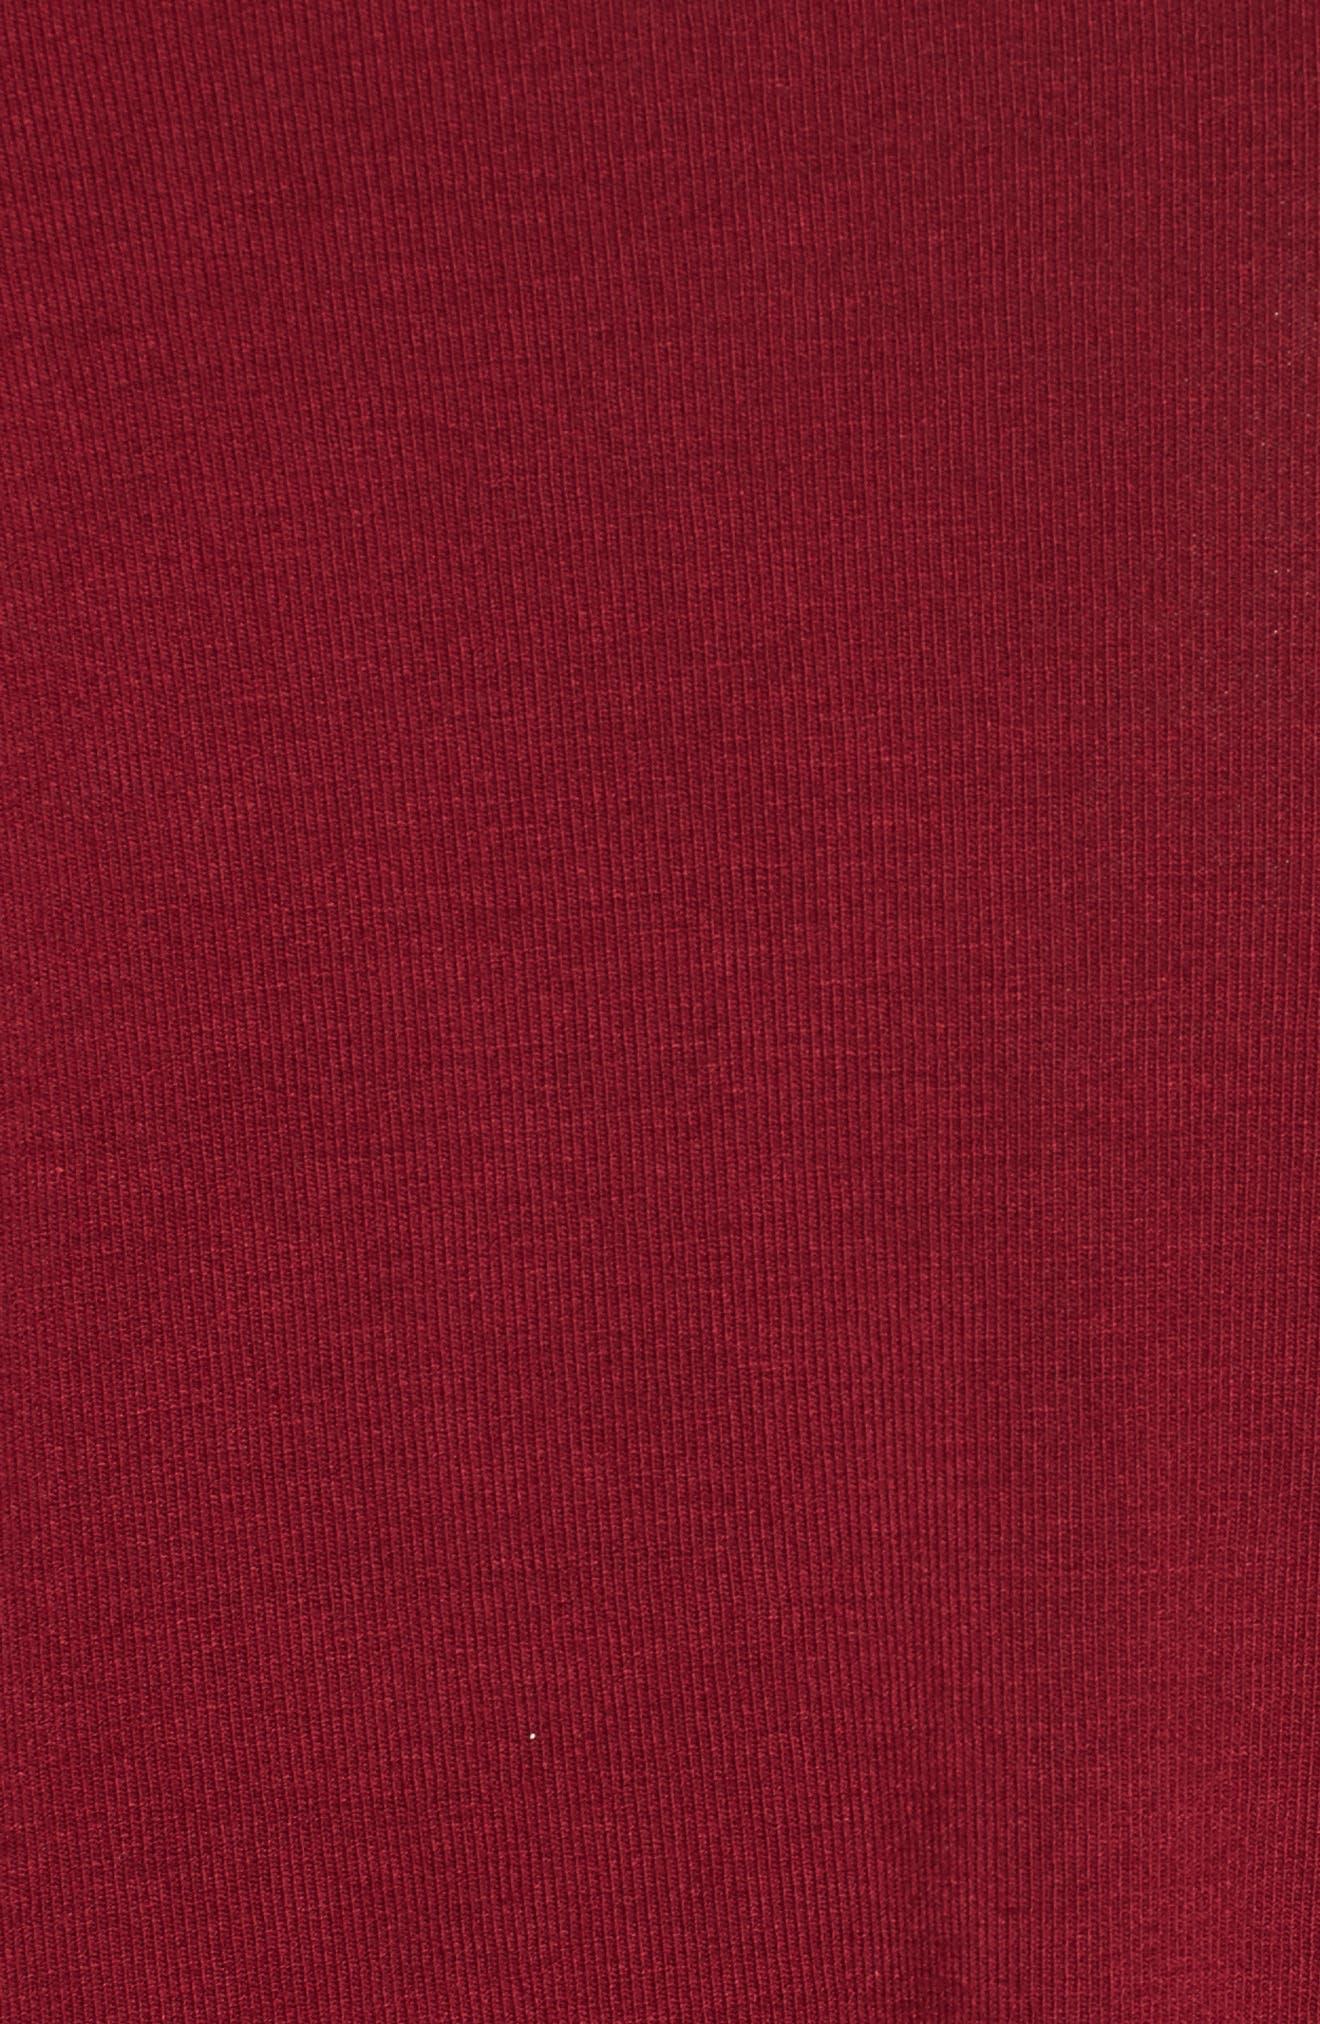 Off the Shoulder Knit A-Line Dress,                             Alternate thumbnail 5, color,                             600